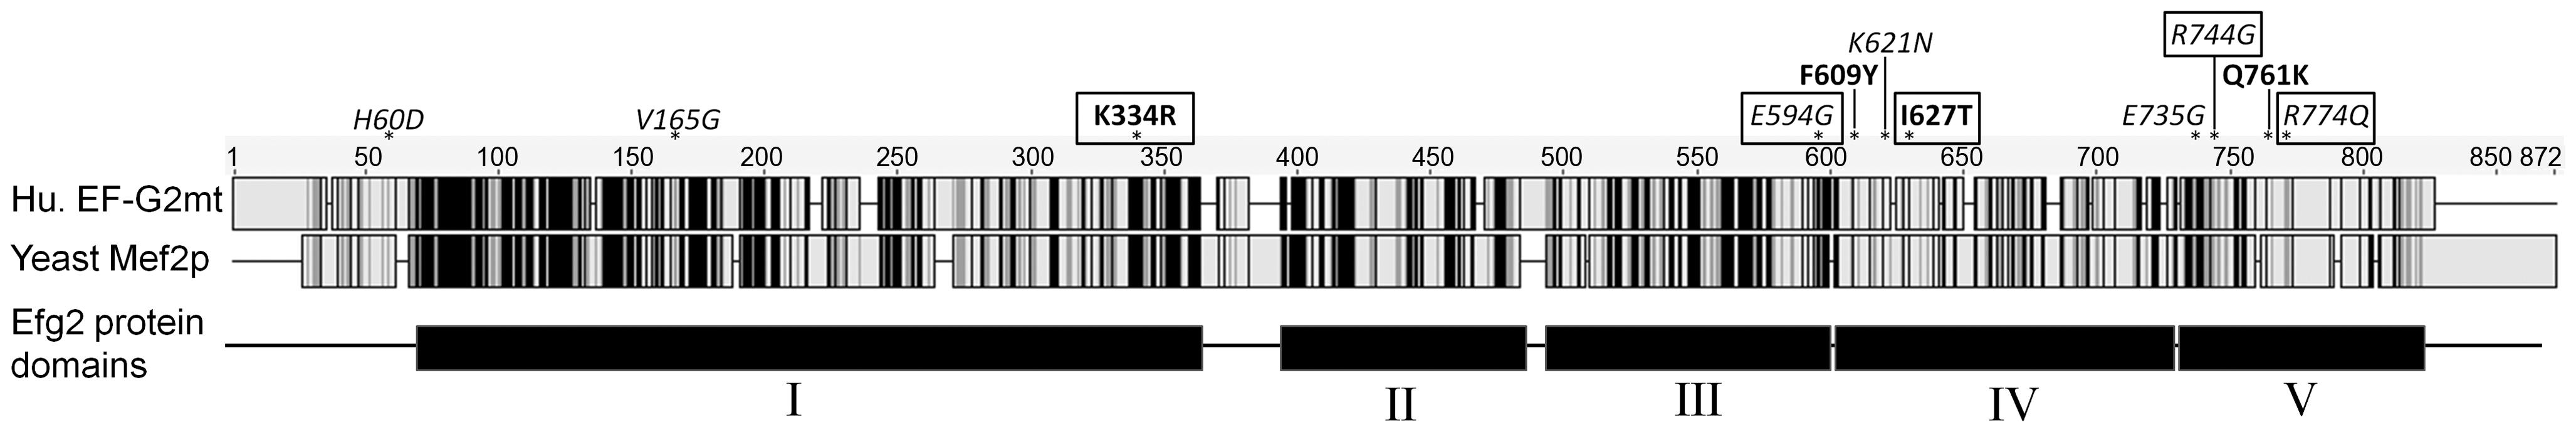 EF-G2mt protein variants.